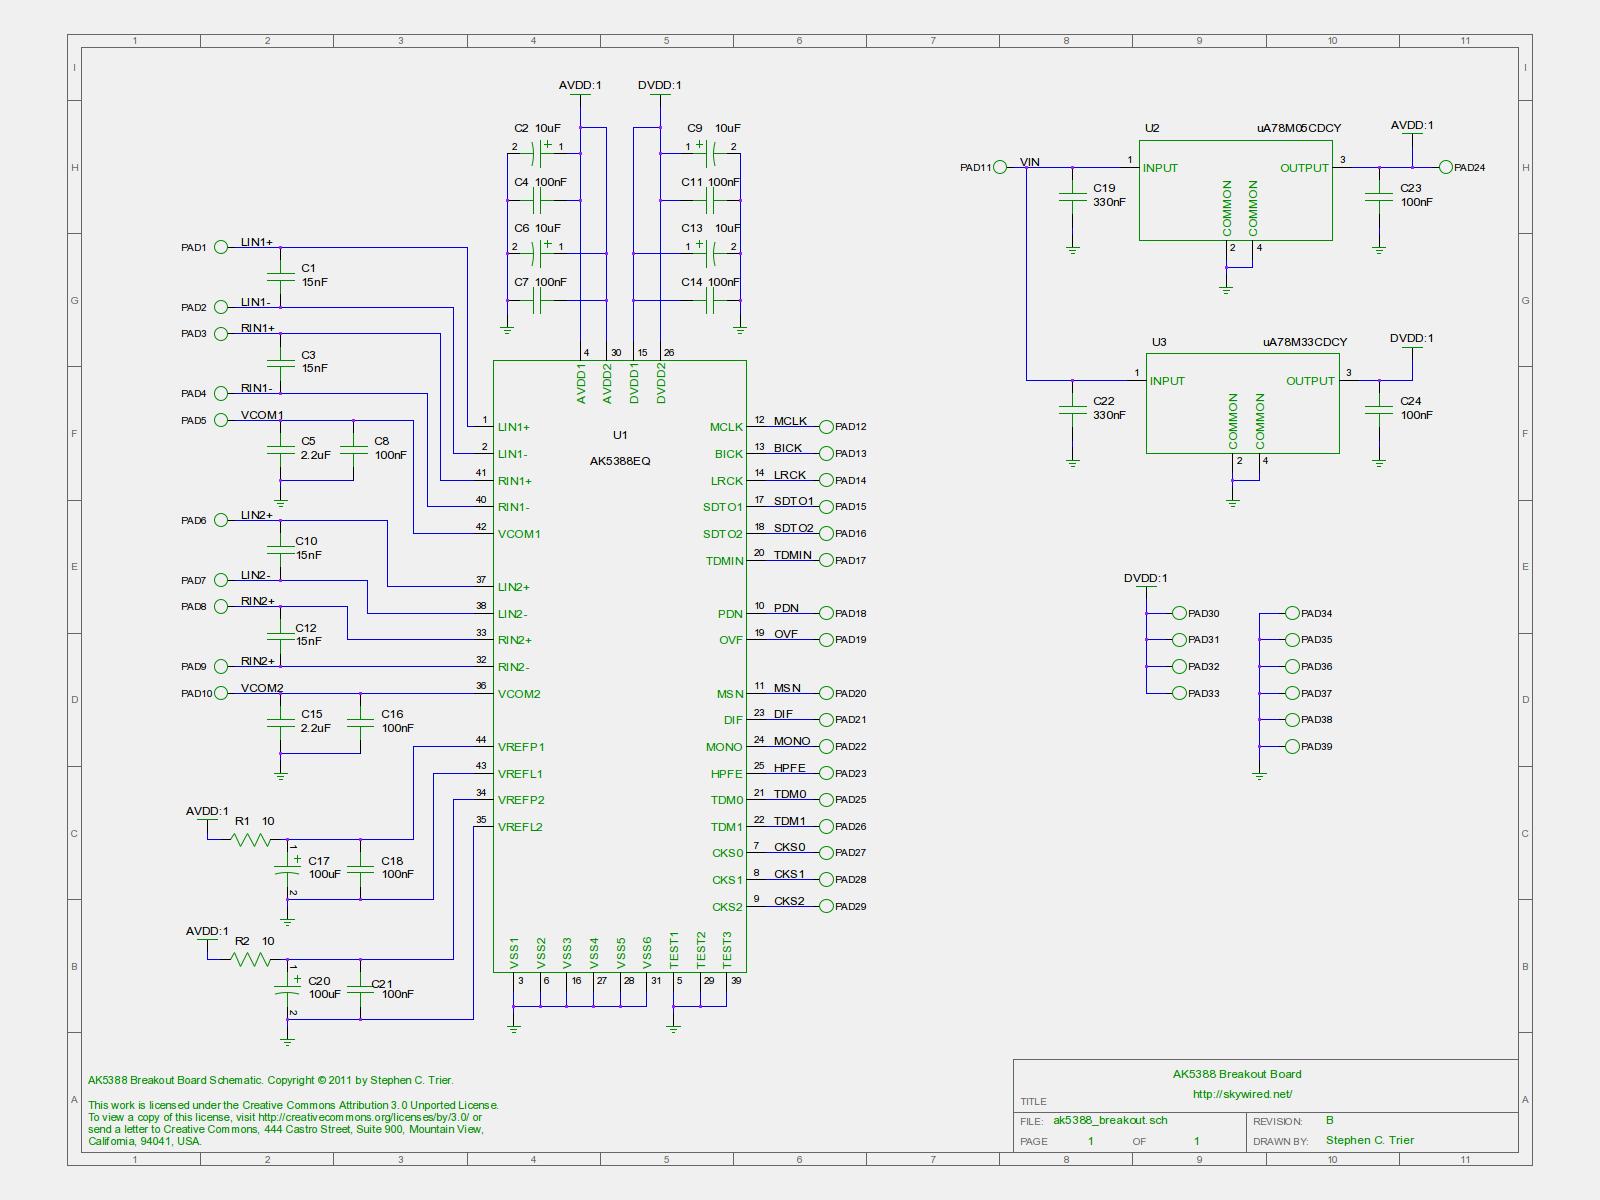 4 axis dm542a wiring diagram db25 rj12 wiring-diagram ... led board wiring diagram c11 breakout board wiring diagram